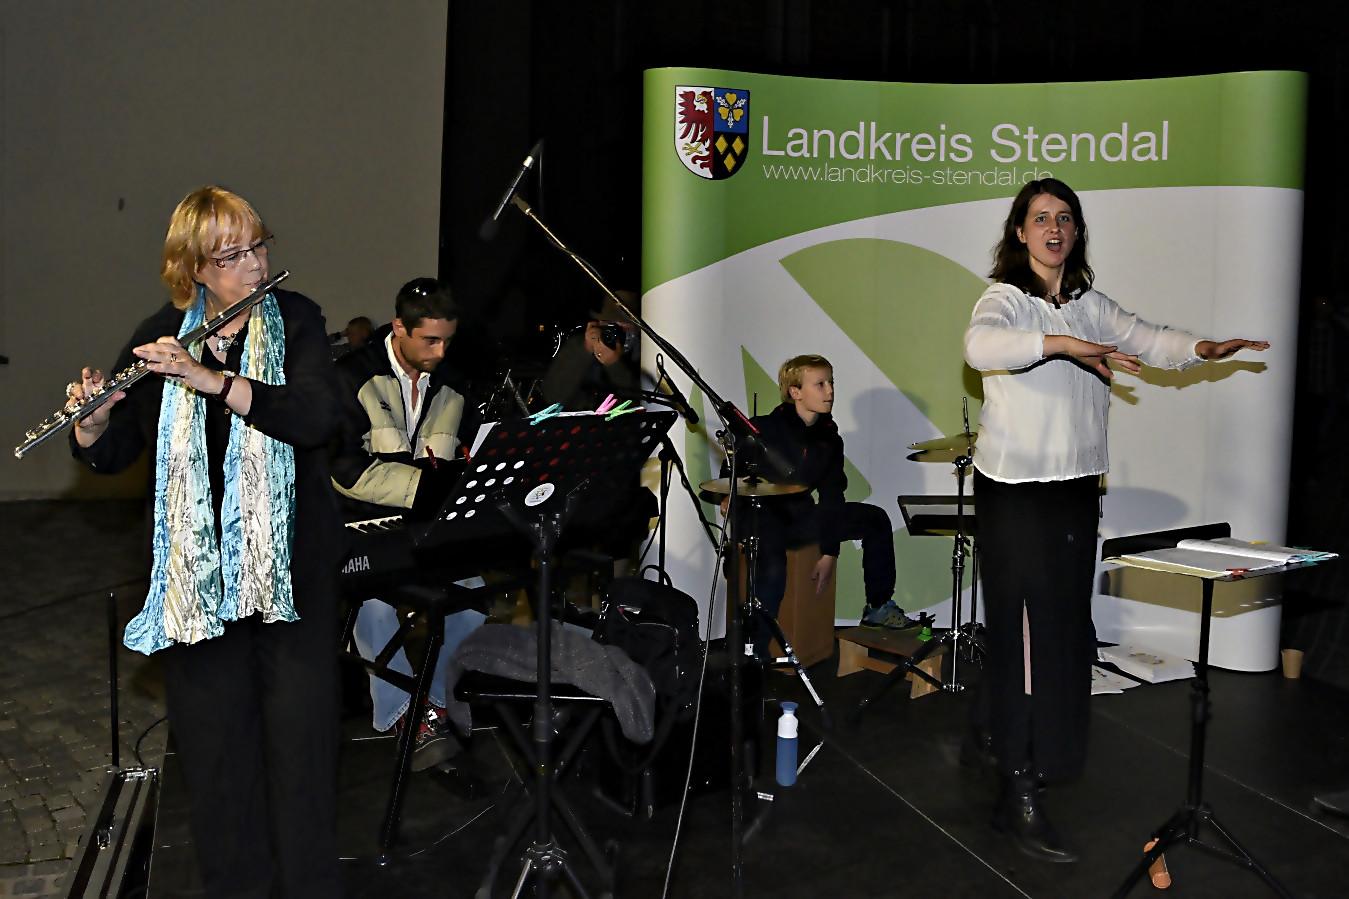 Stendal: musikalisches Ensemble